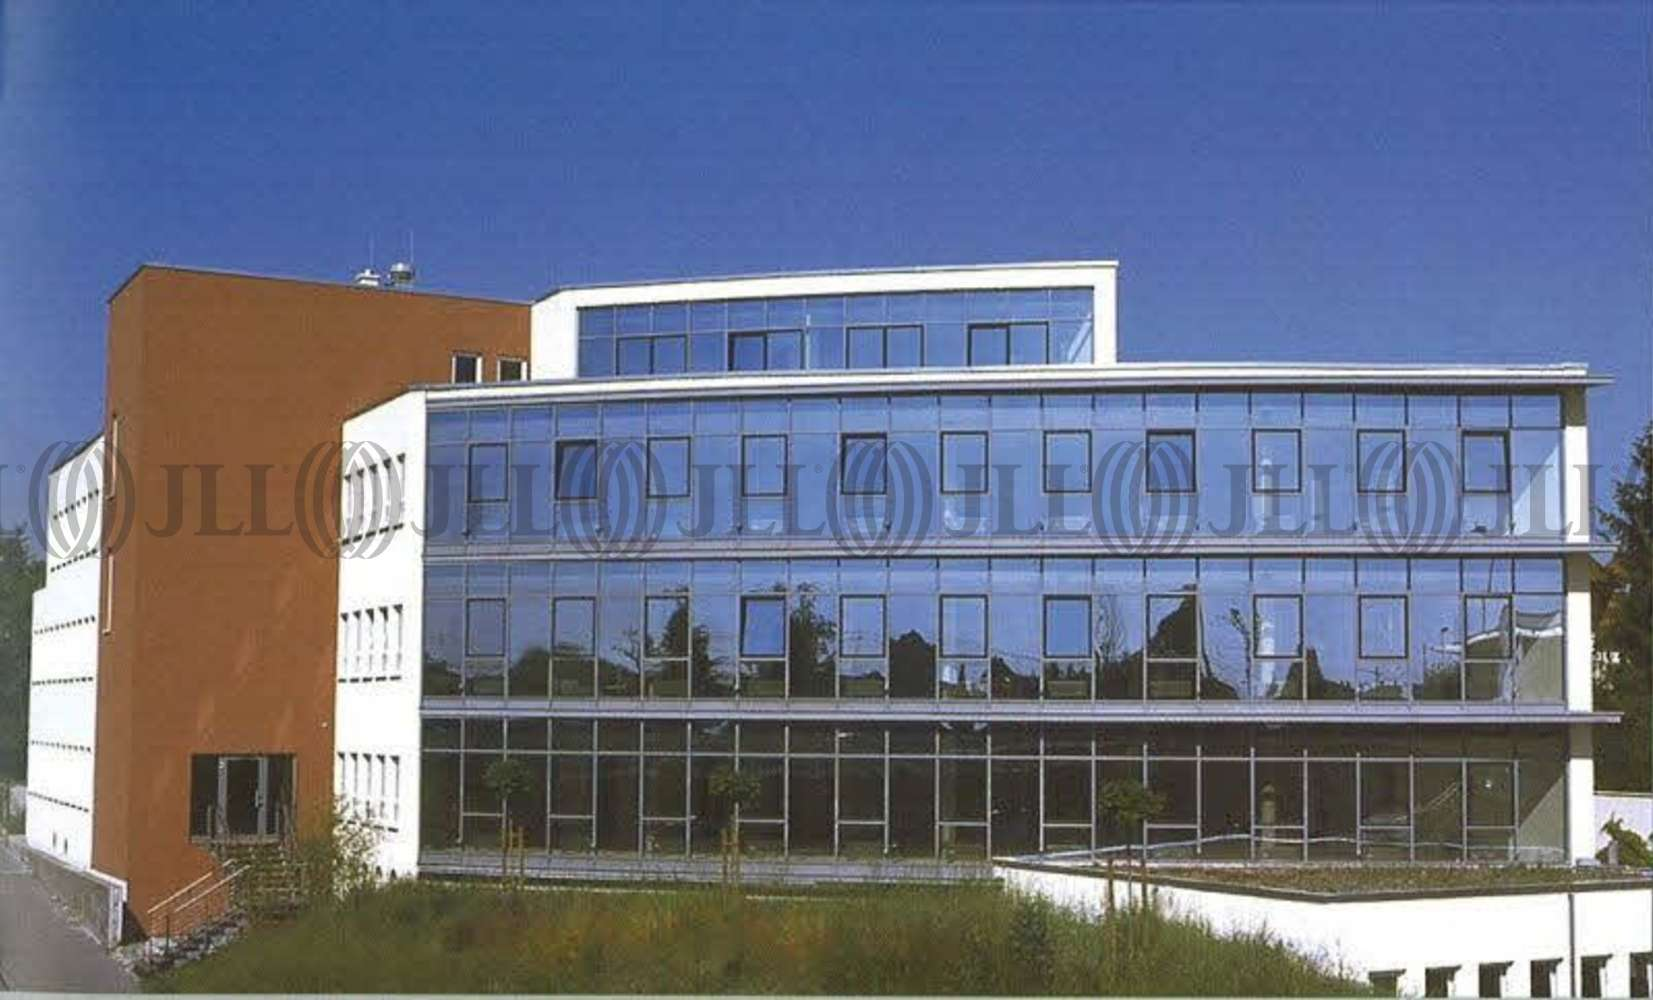 Büros Oberursel (taunus), 61440 - Büro - Oberursel (Taunus) - F1101 - 9386491